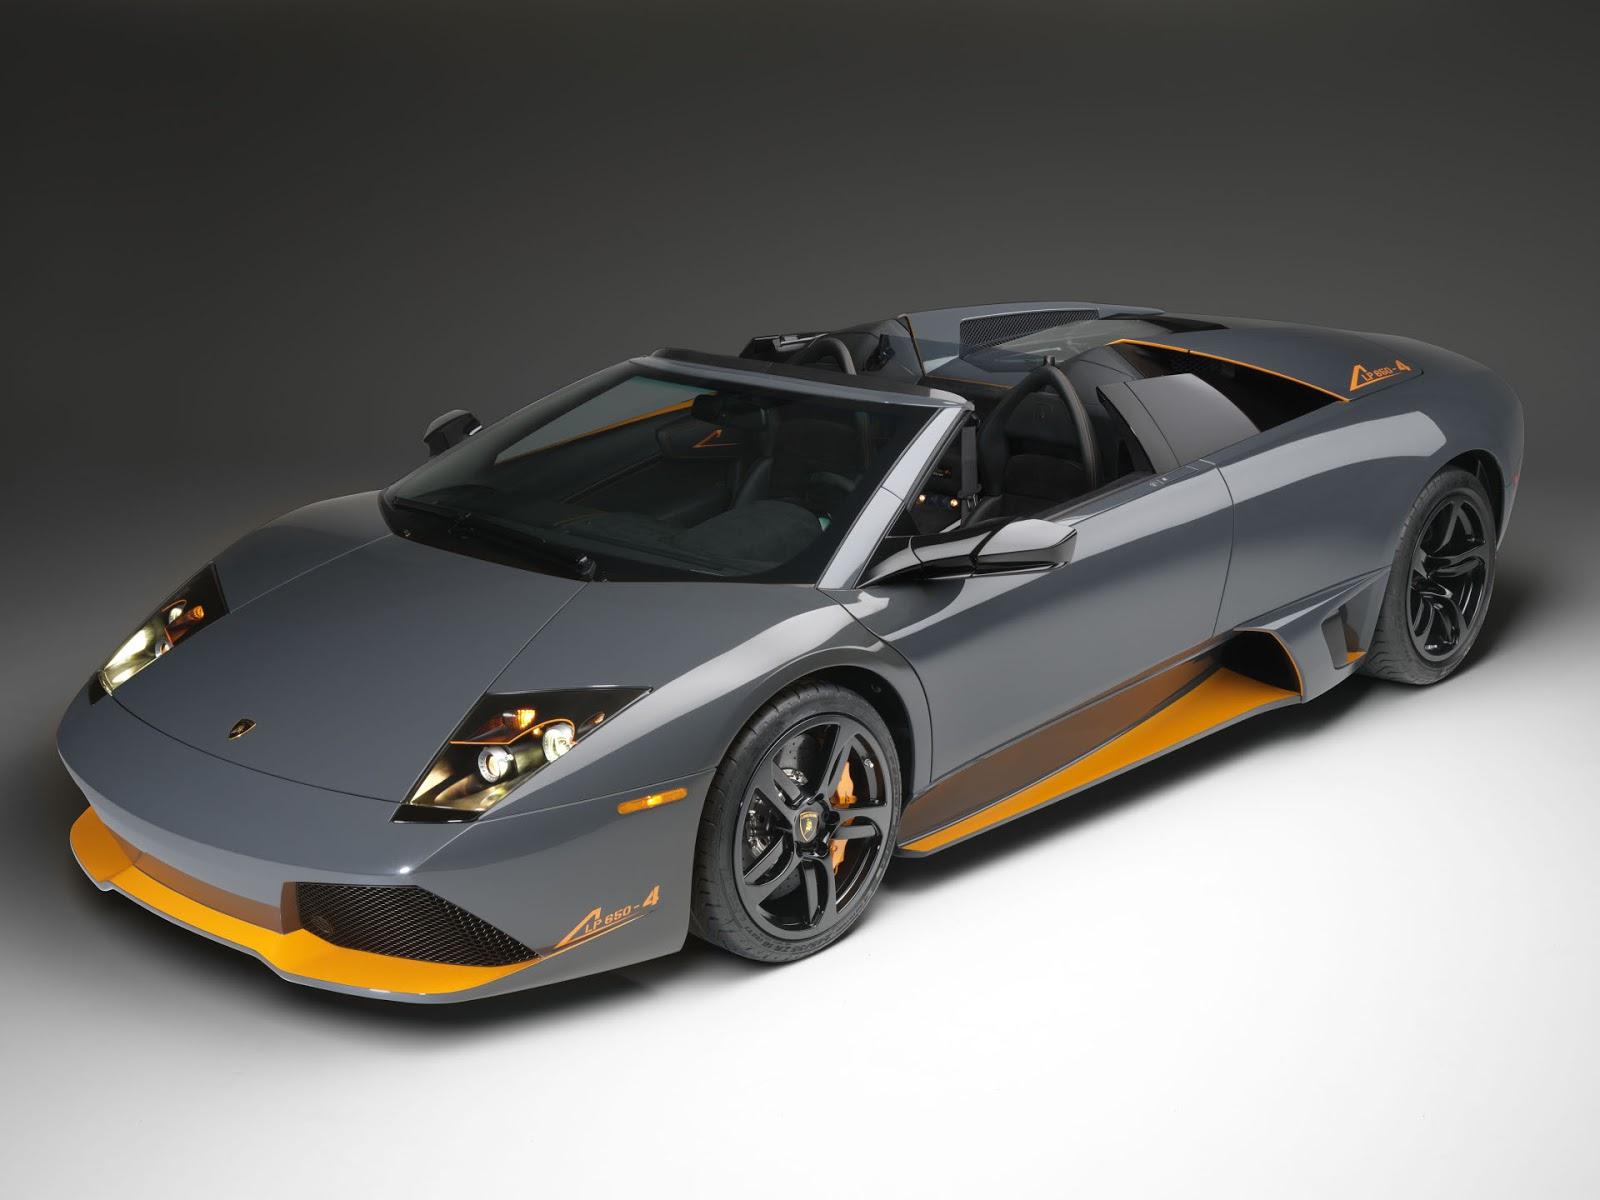 Luxury Lamborghini Cars Black Lamborghini Murcielago